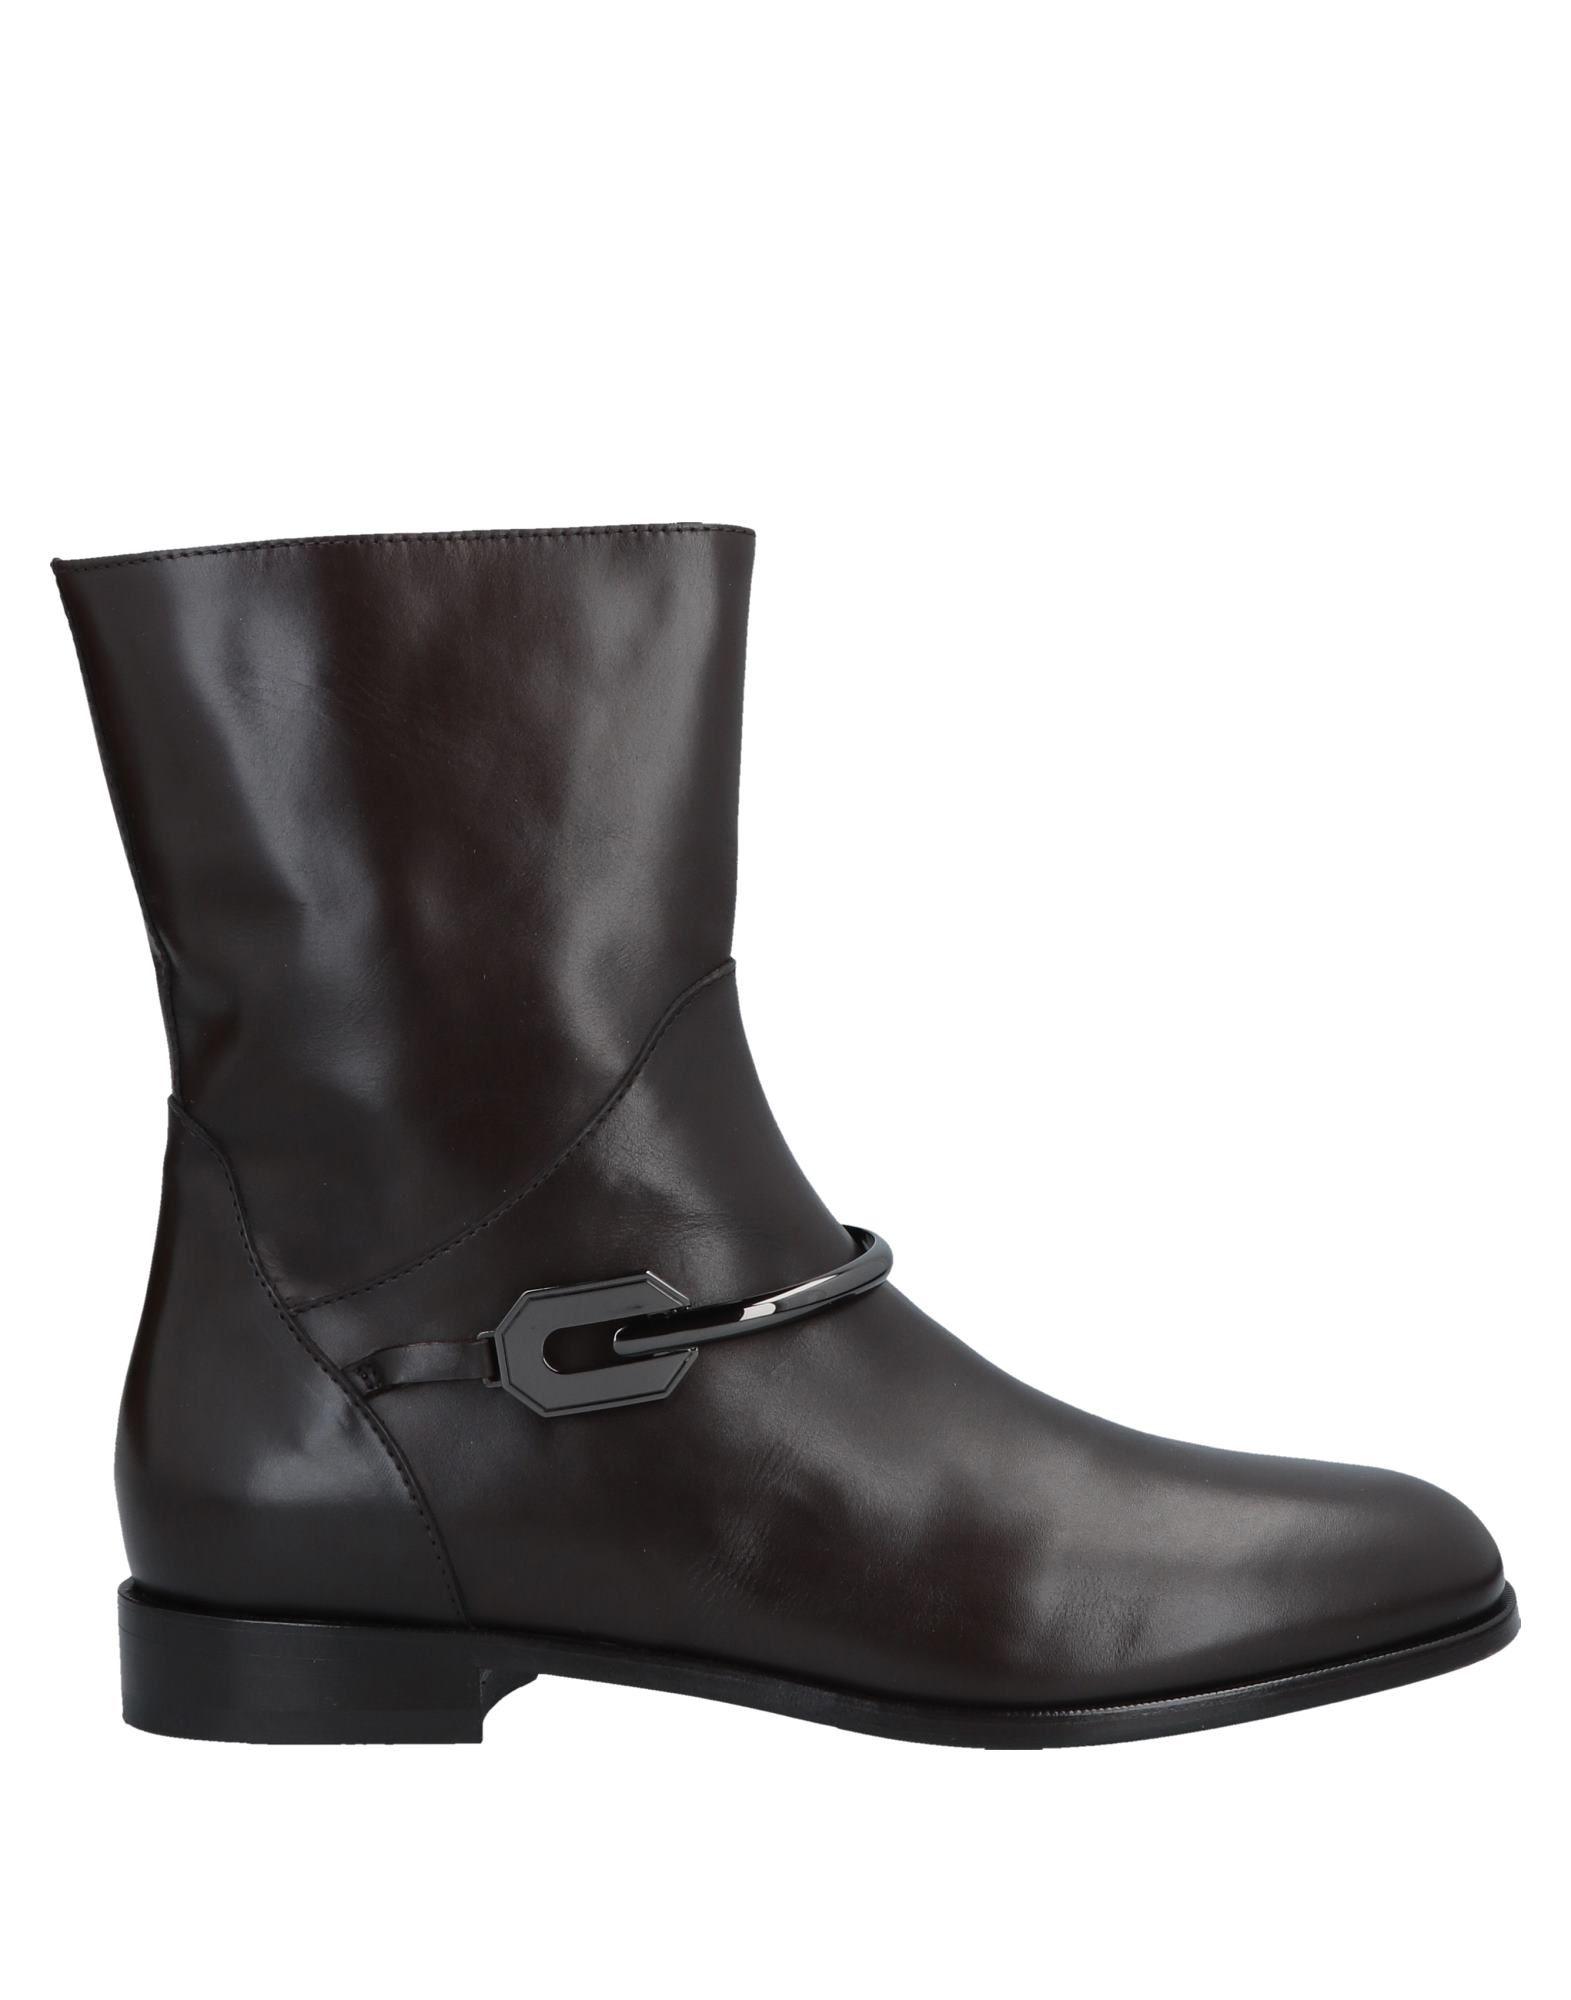 MAGLI by BRUNO MAGLI Полусапоги и высокие ботинки туфли marani magli